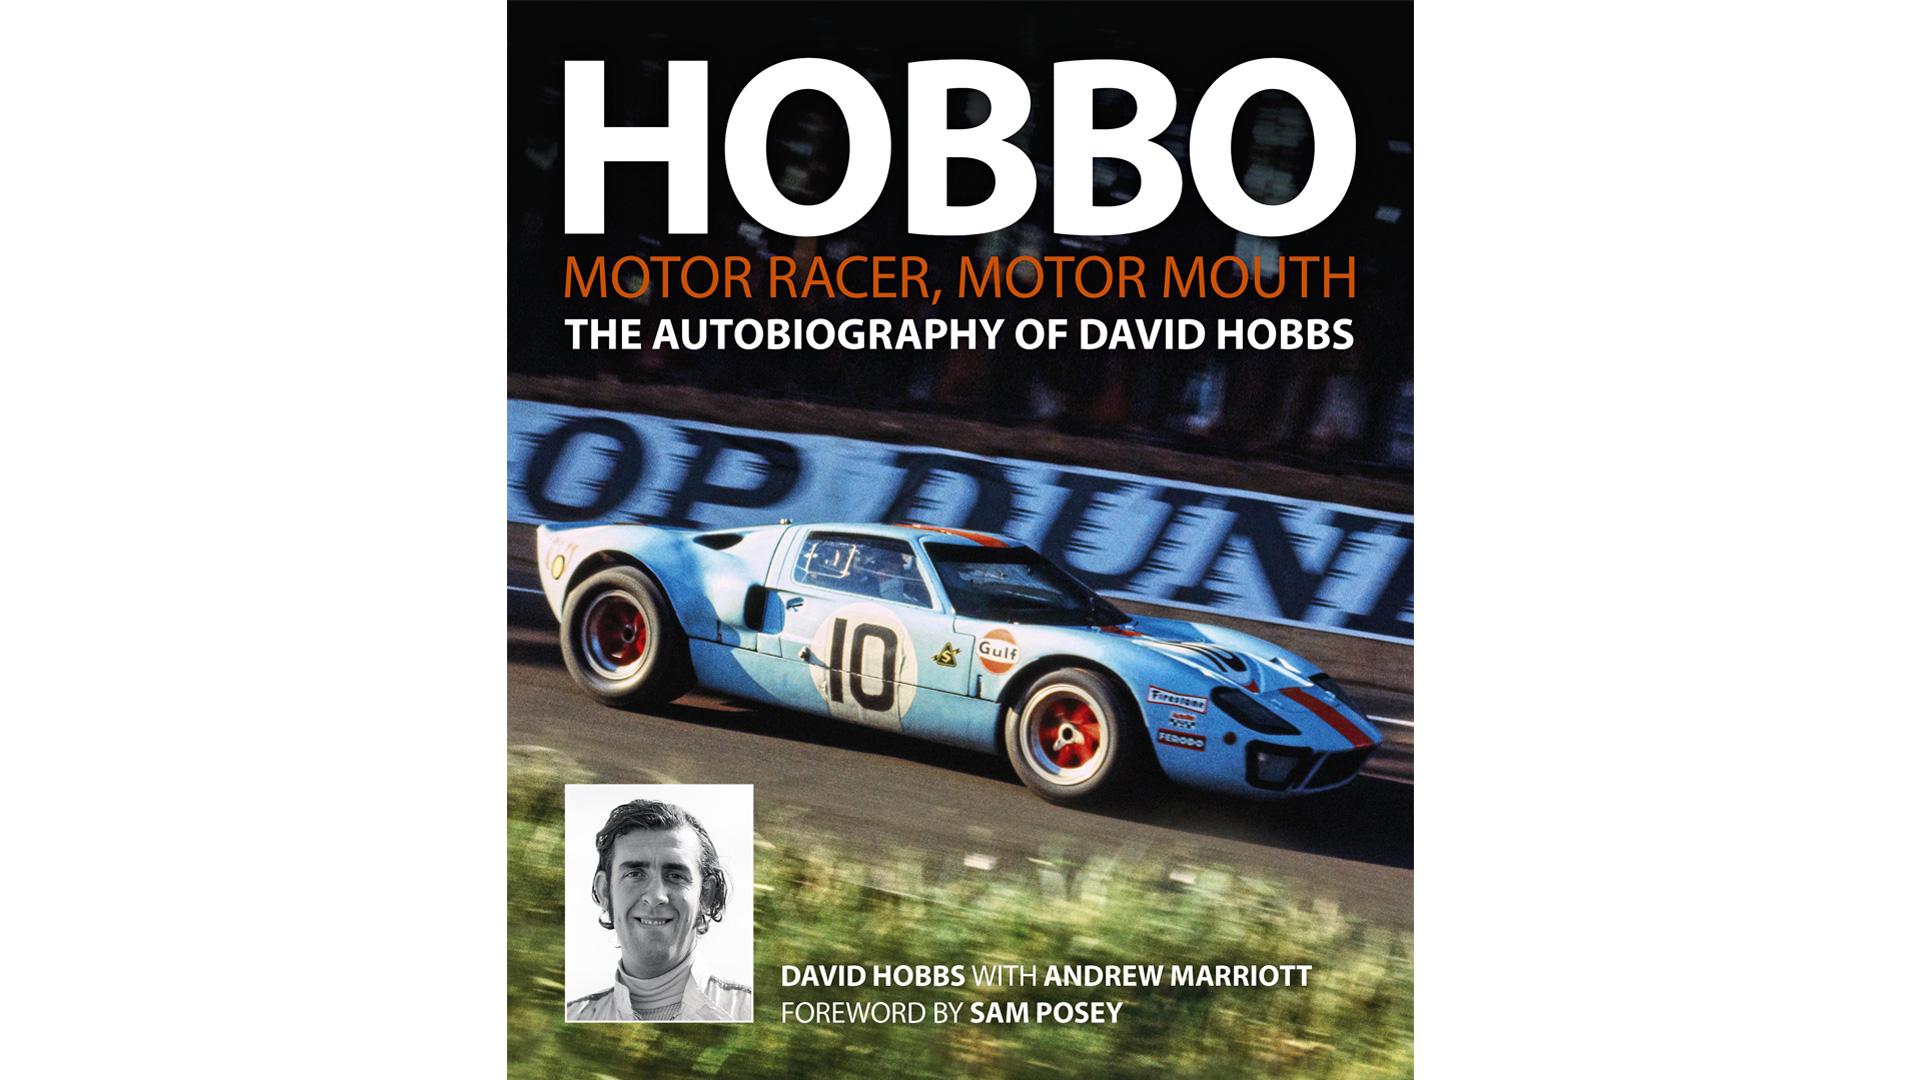 Hobbo: David Hobbs autobiography